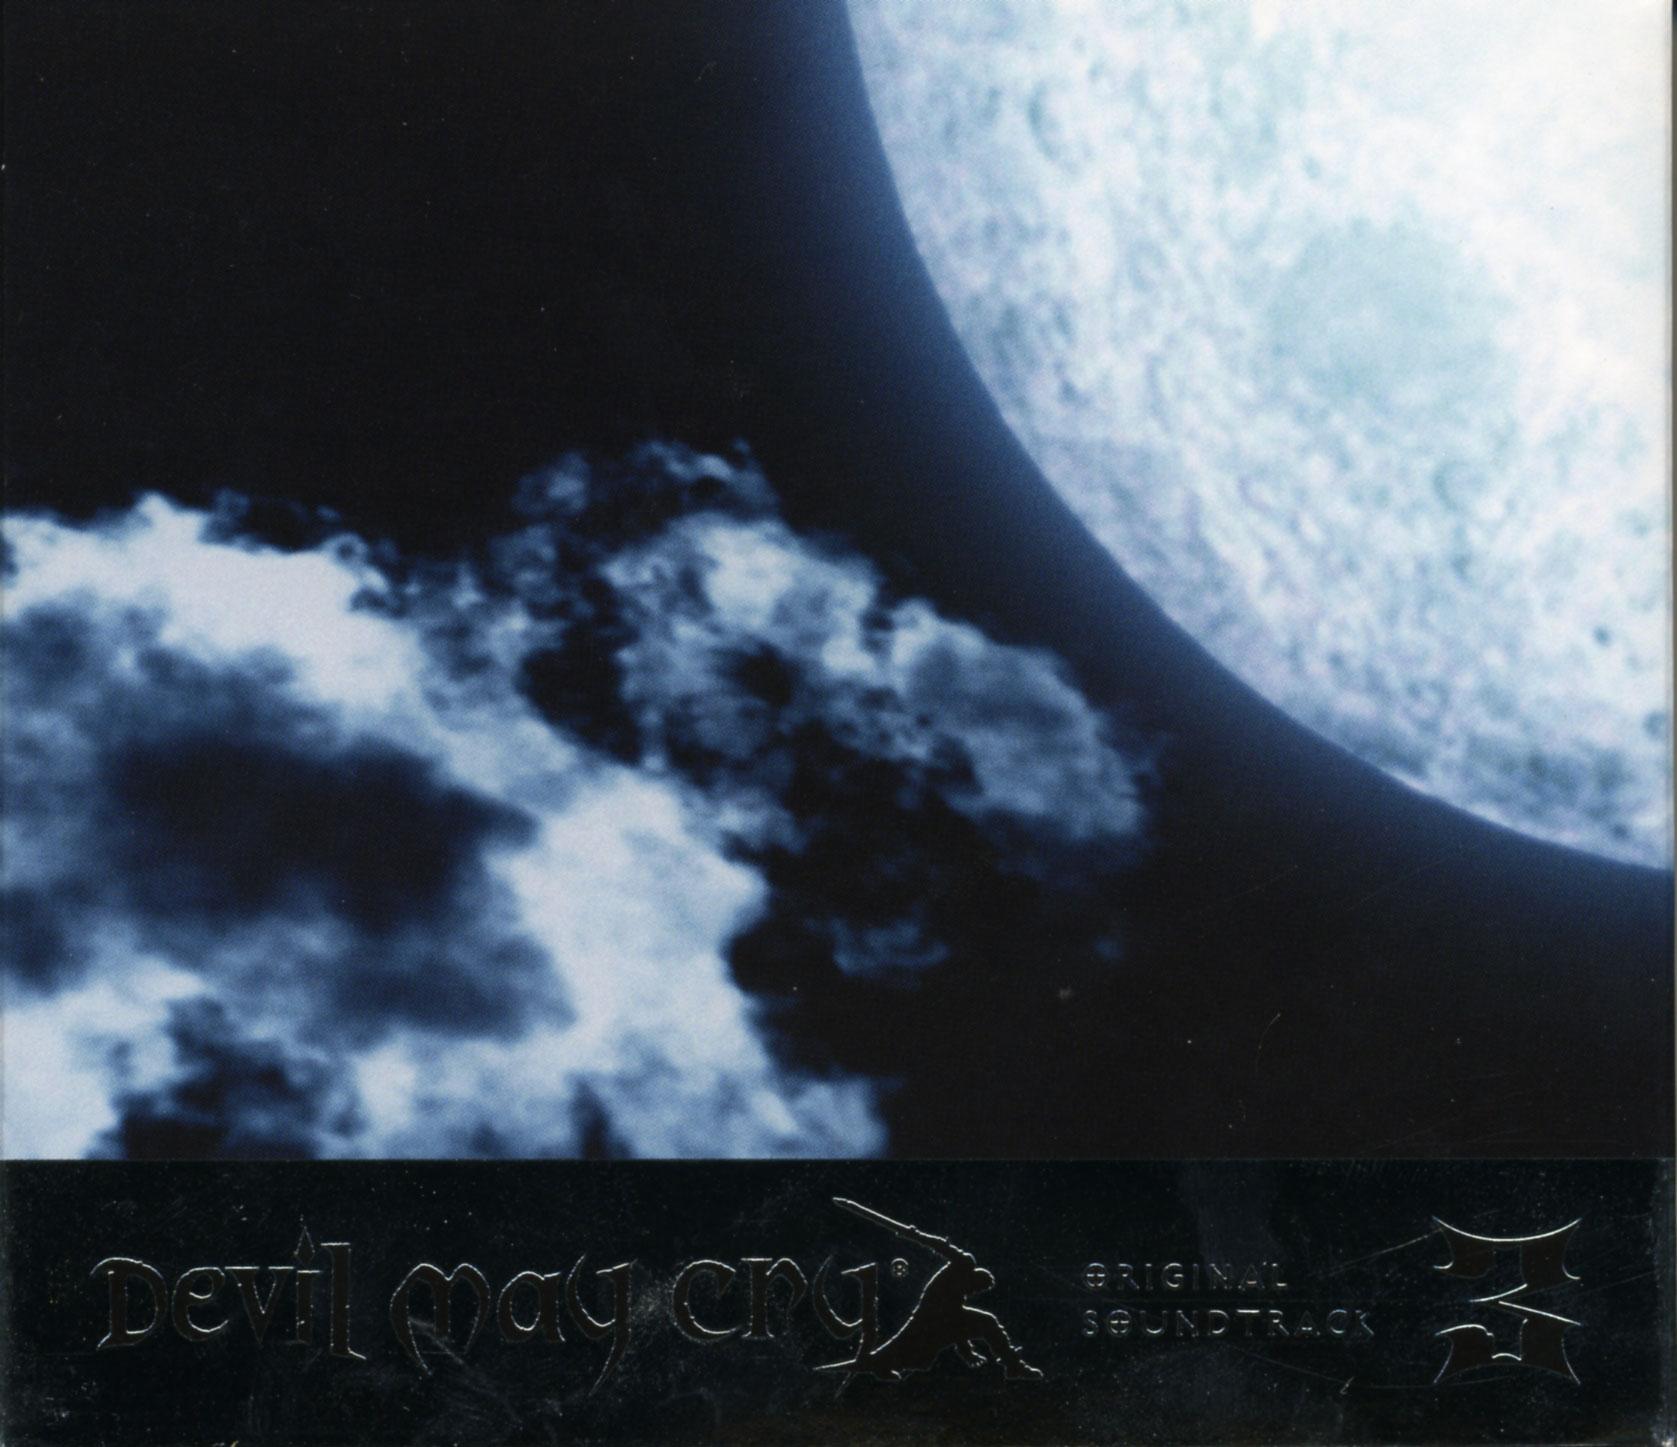 Archivo:Devil May Cry 3 Original Soundtrack.jpg